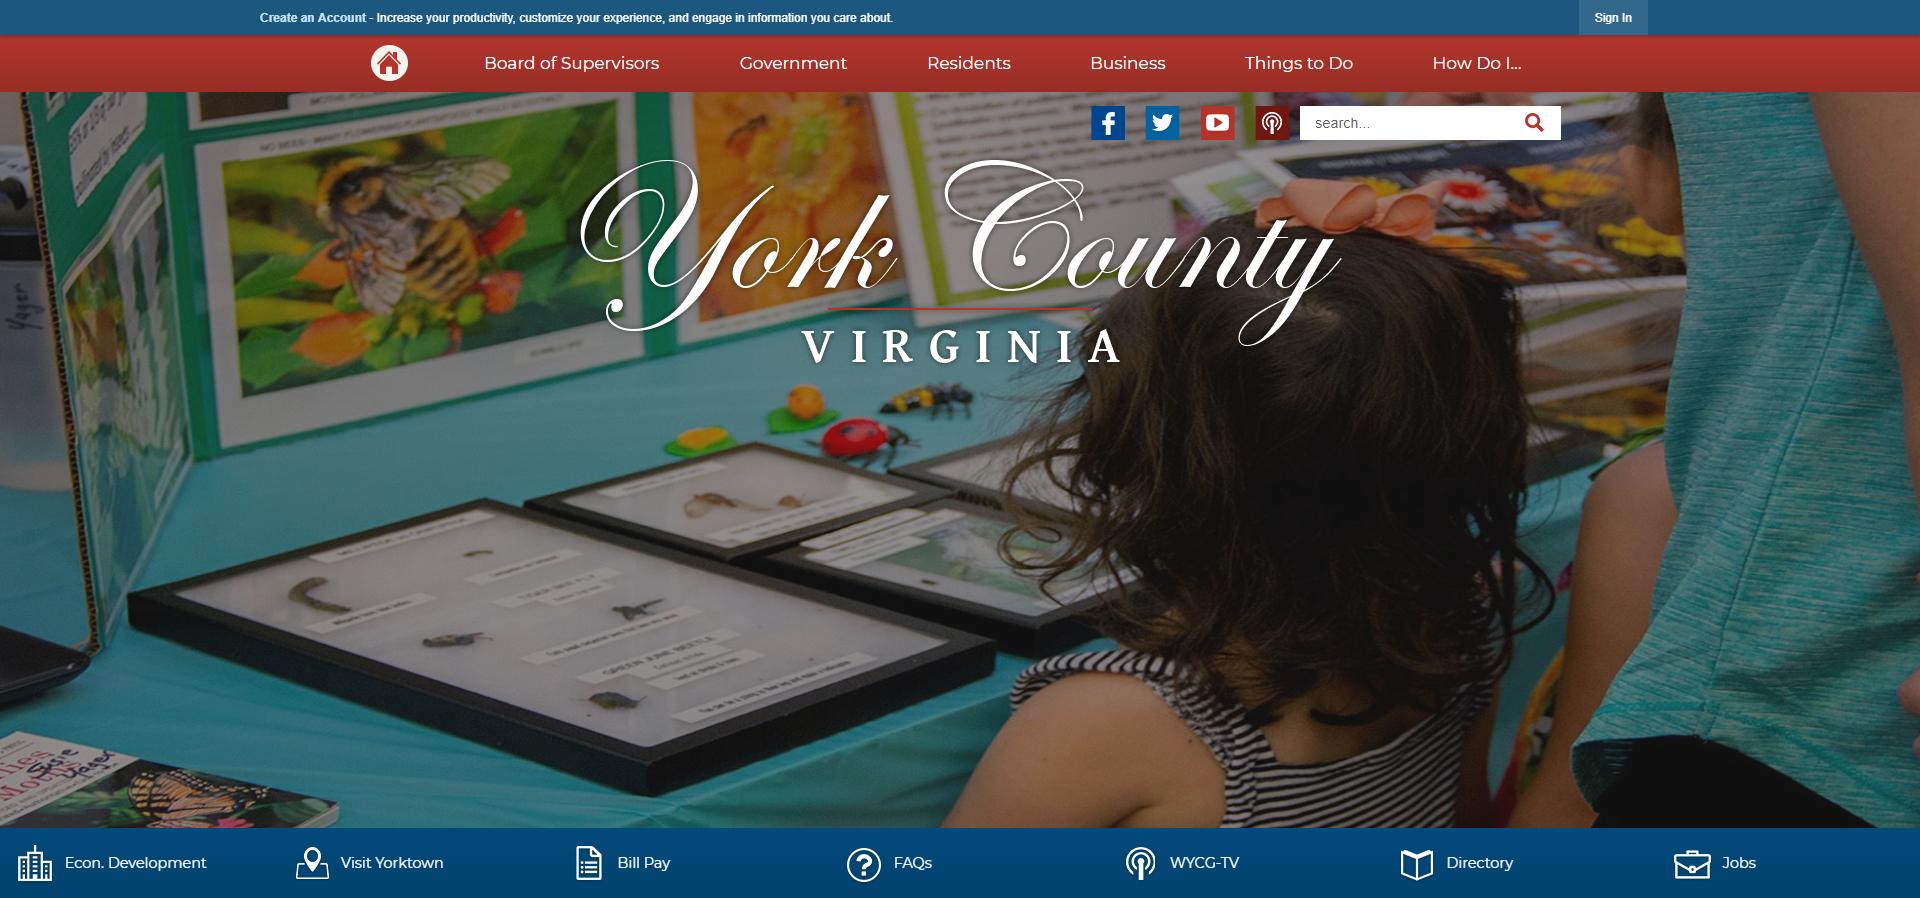 York_County_VA_2018_Digital_Counties_Award_Winner